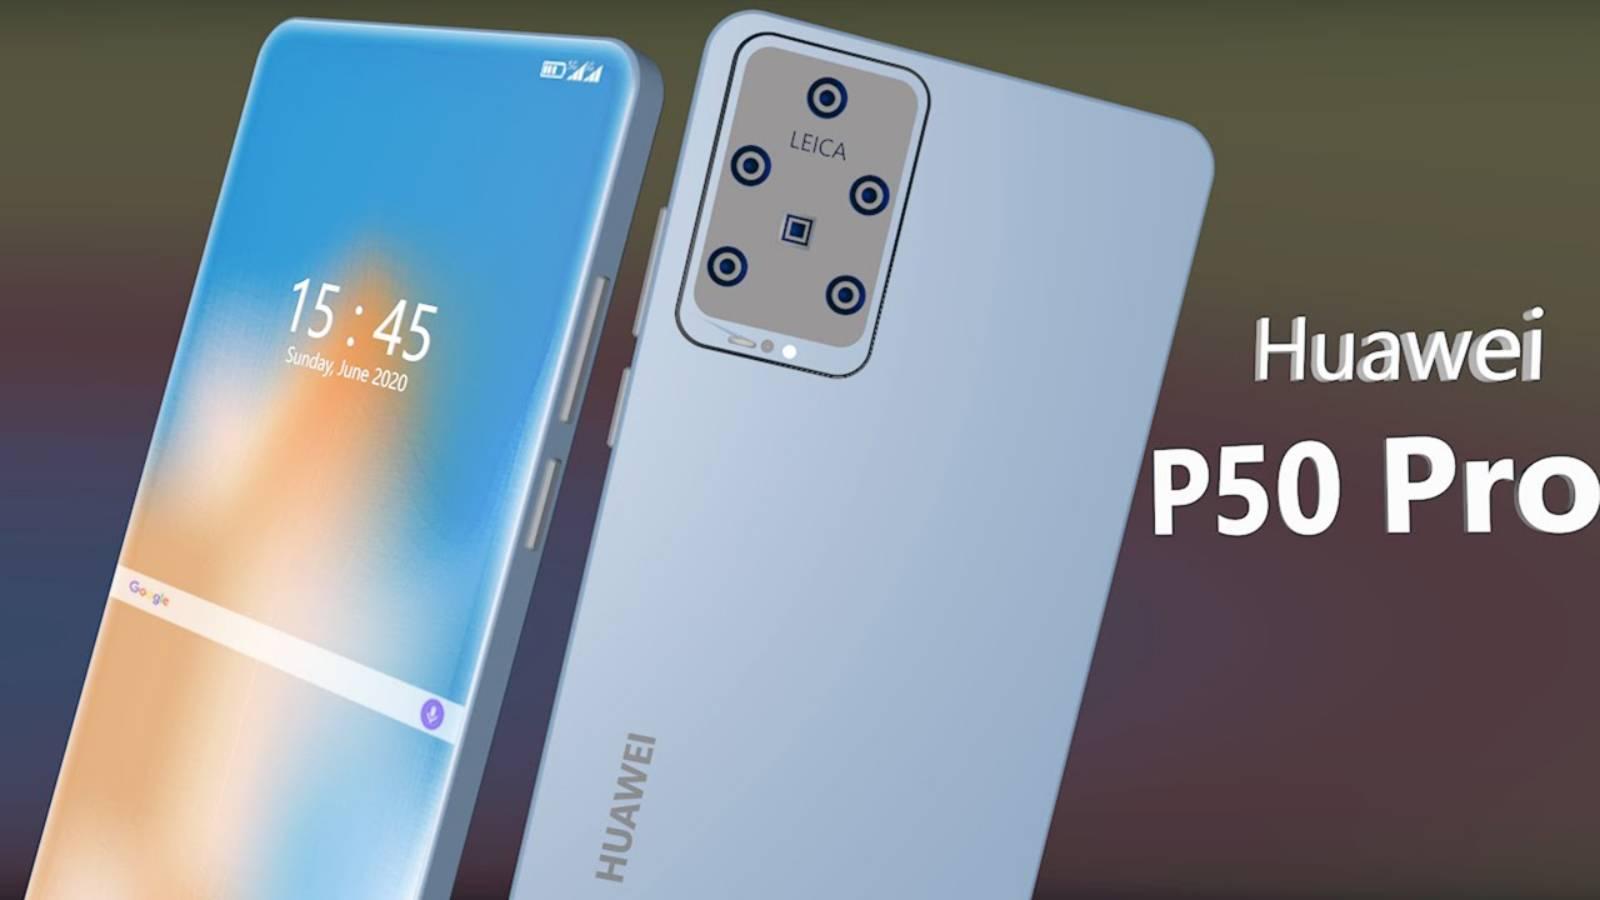 Huawei P50 Pro qualcomm